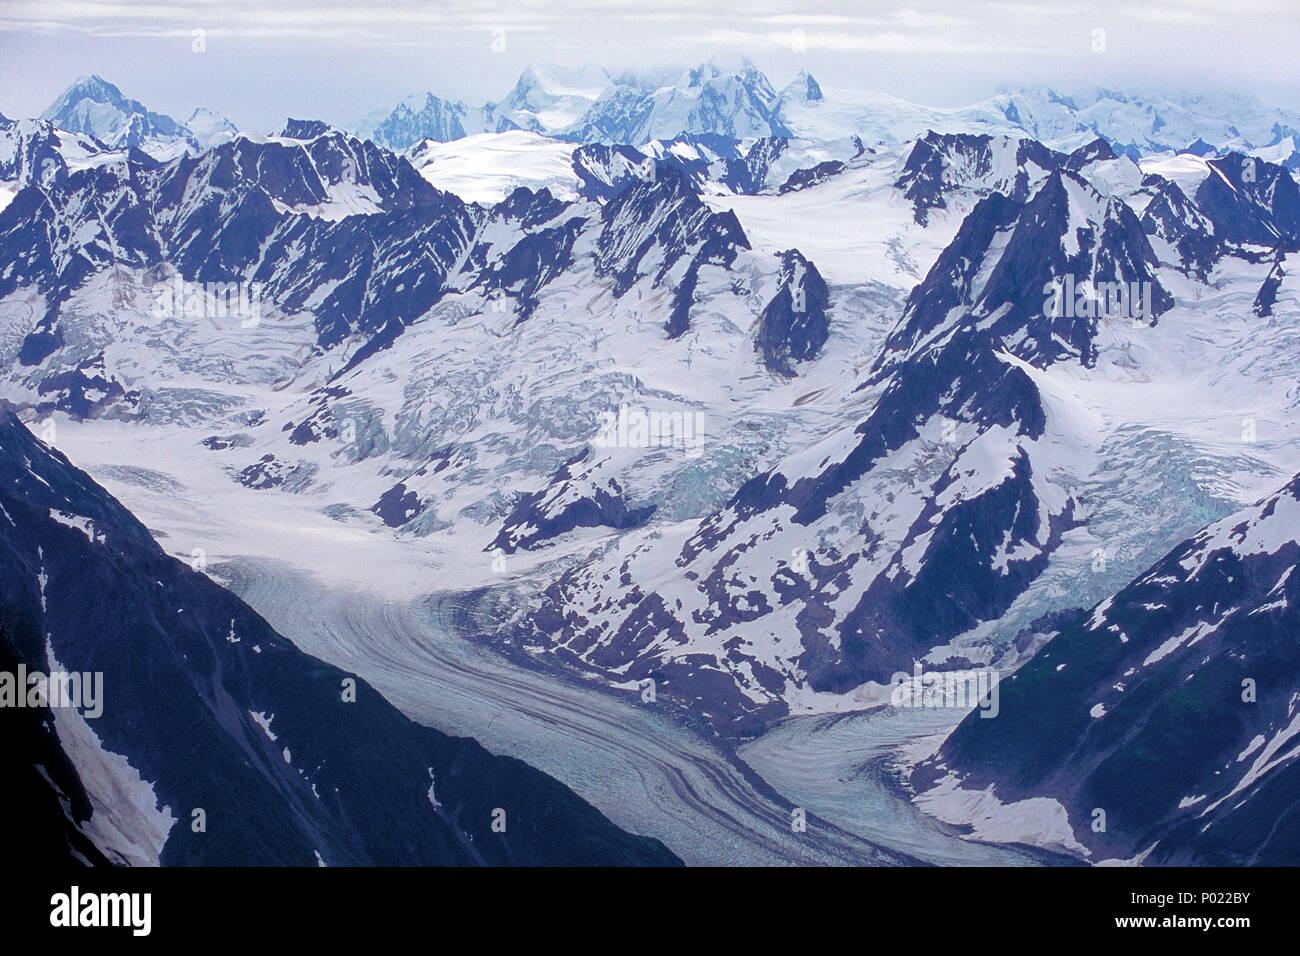 Gletscher im Yukon, tolle Landschaften, Schnee, Eis, Berge, Alaska Range, Yukon, Kanada Stockbild